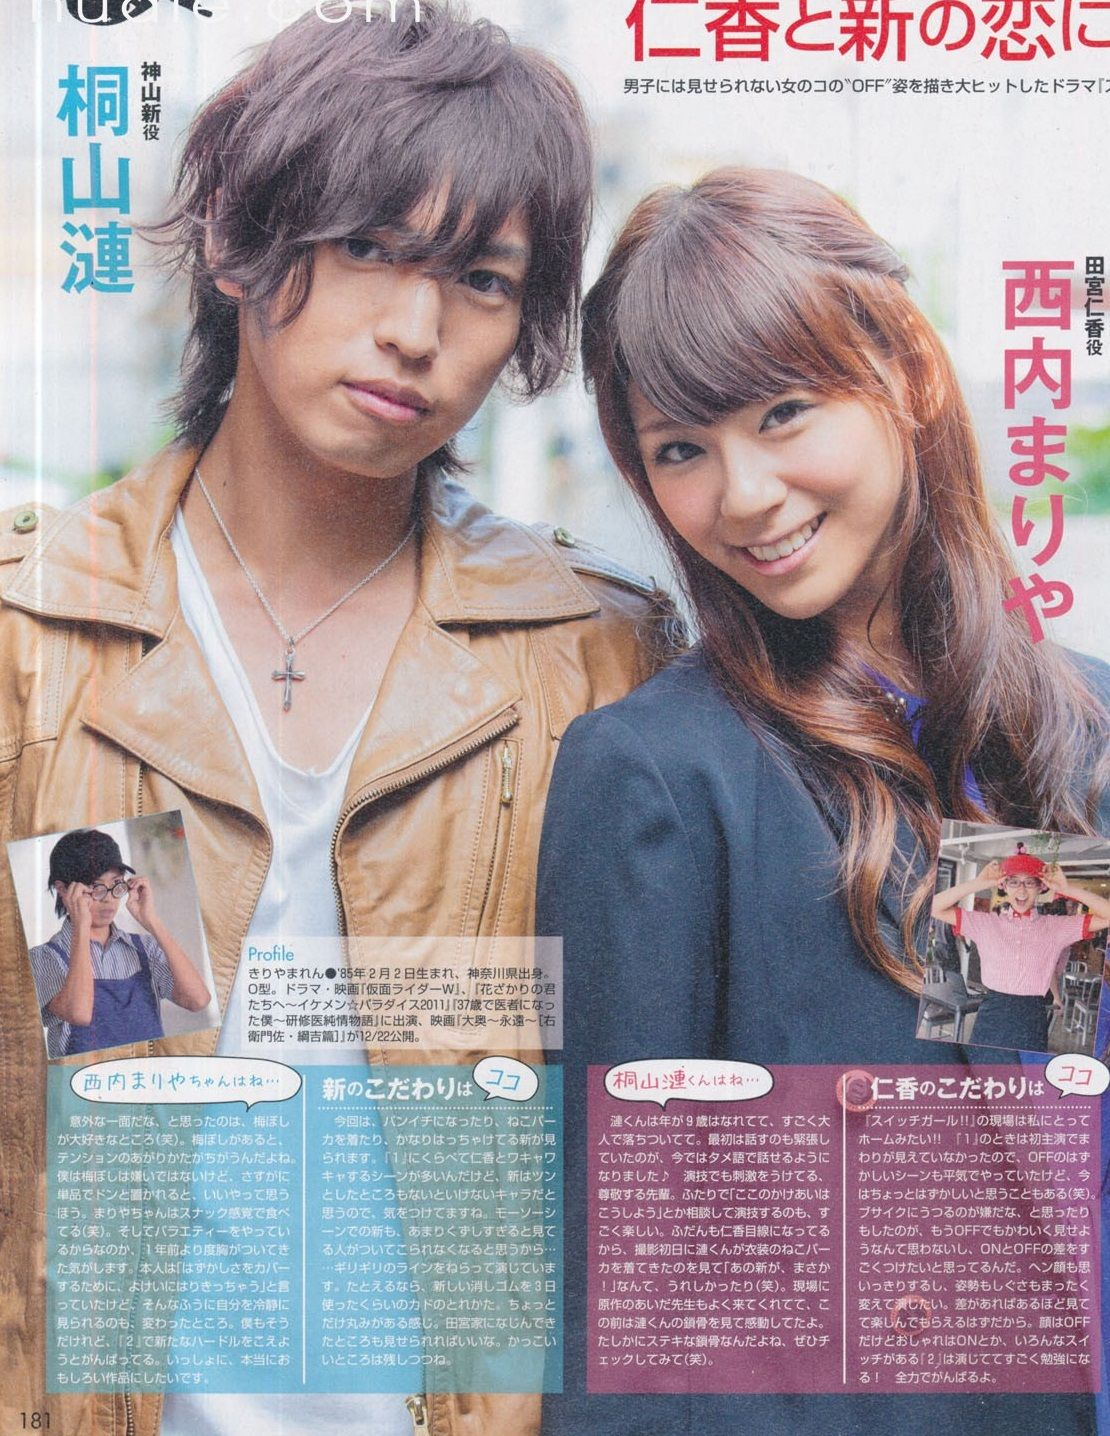 nishiuchi mariya and kiriyama renn dating